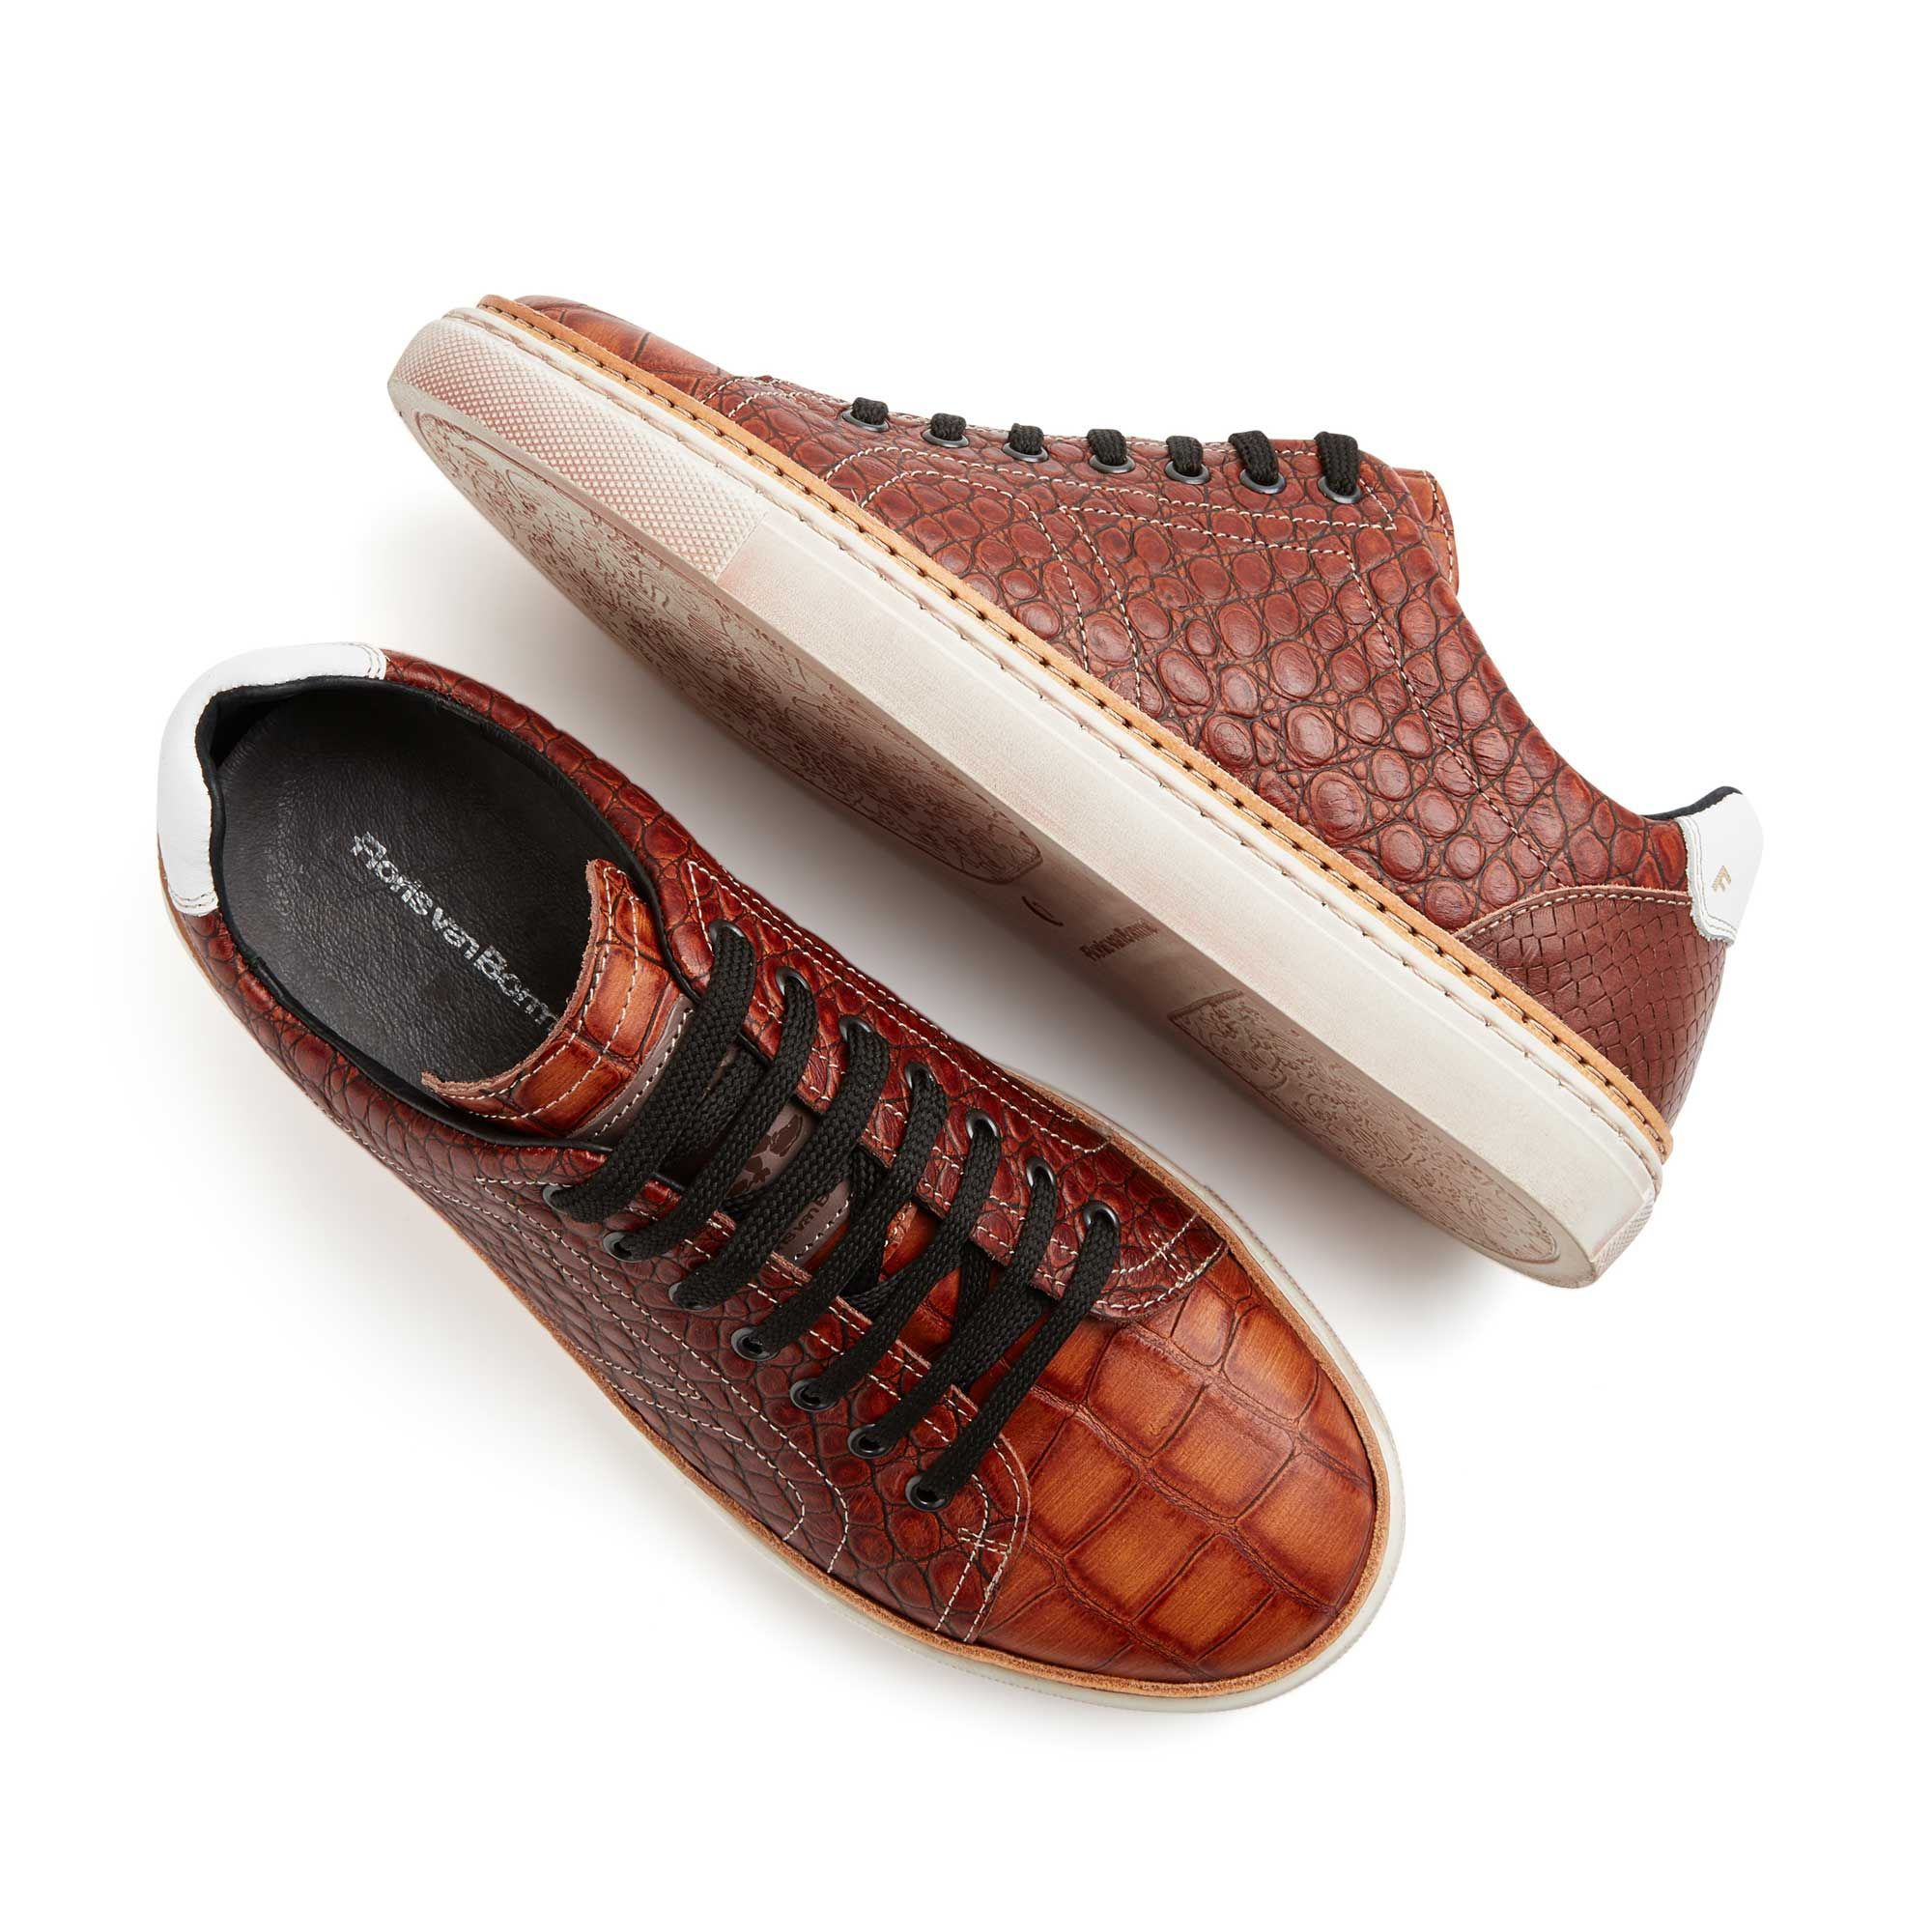 14356 09 Floris Van Bommel Cognac Men S Sneaker With Crocodile Print